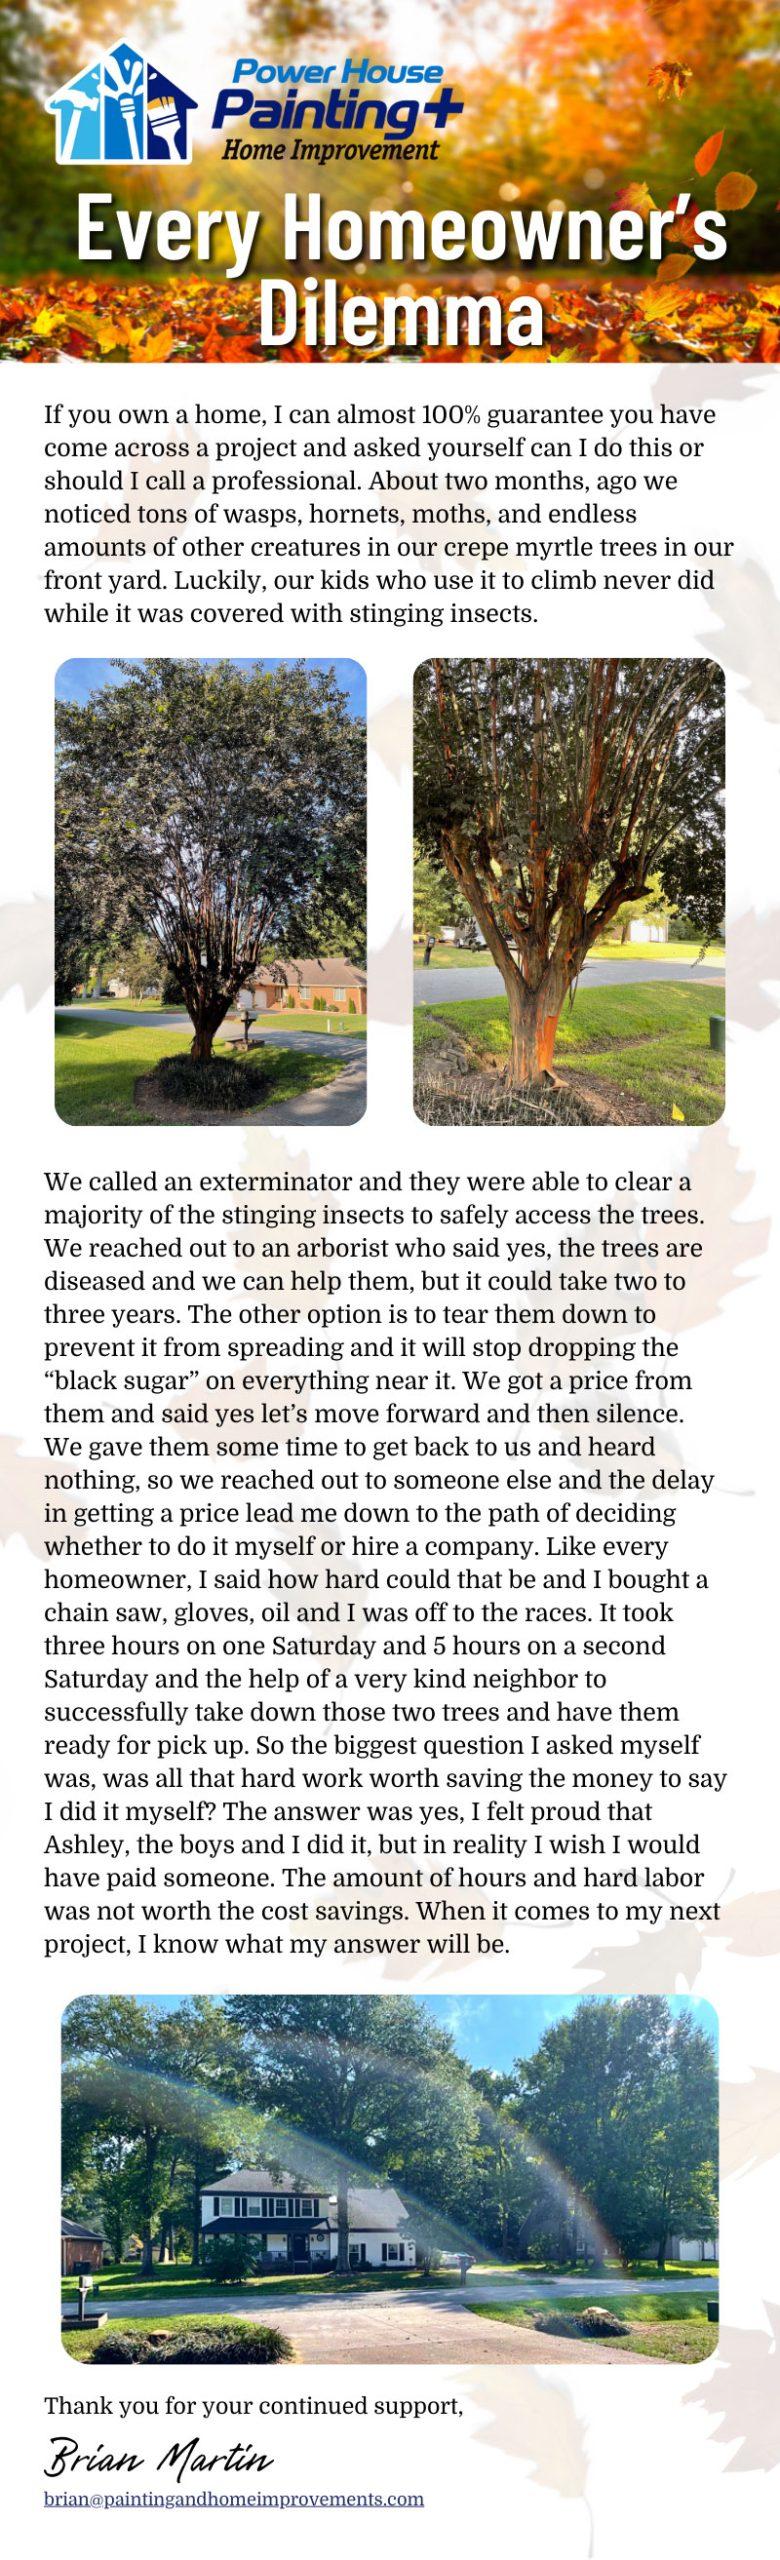 Every Homeowner's Dilemma 3